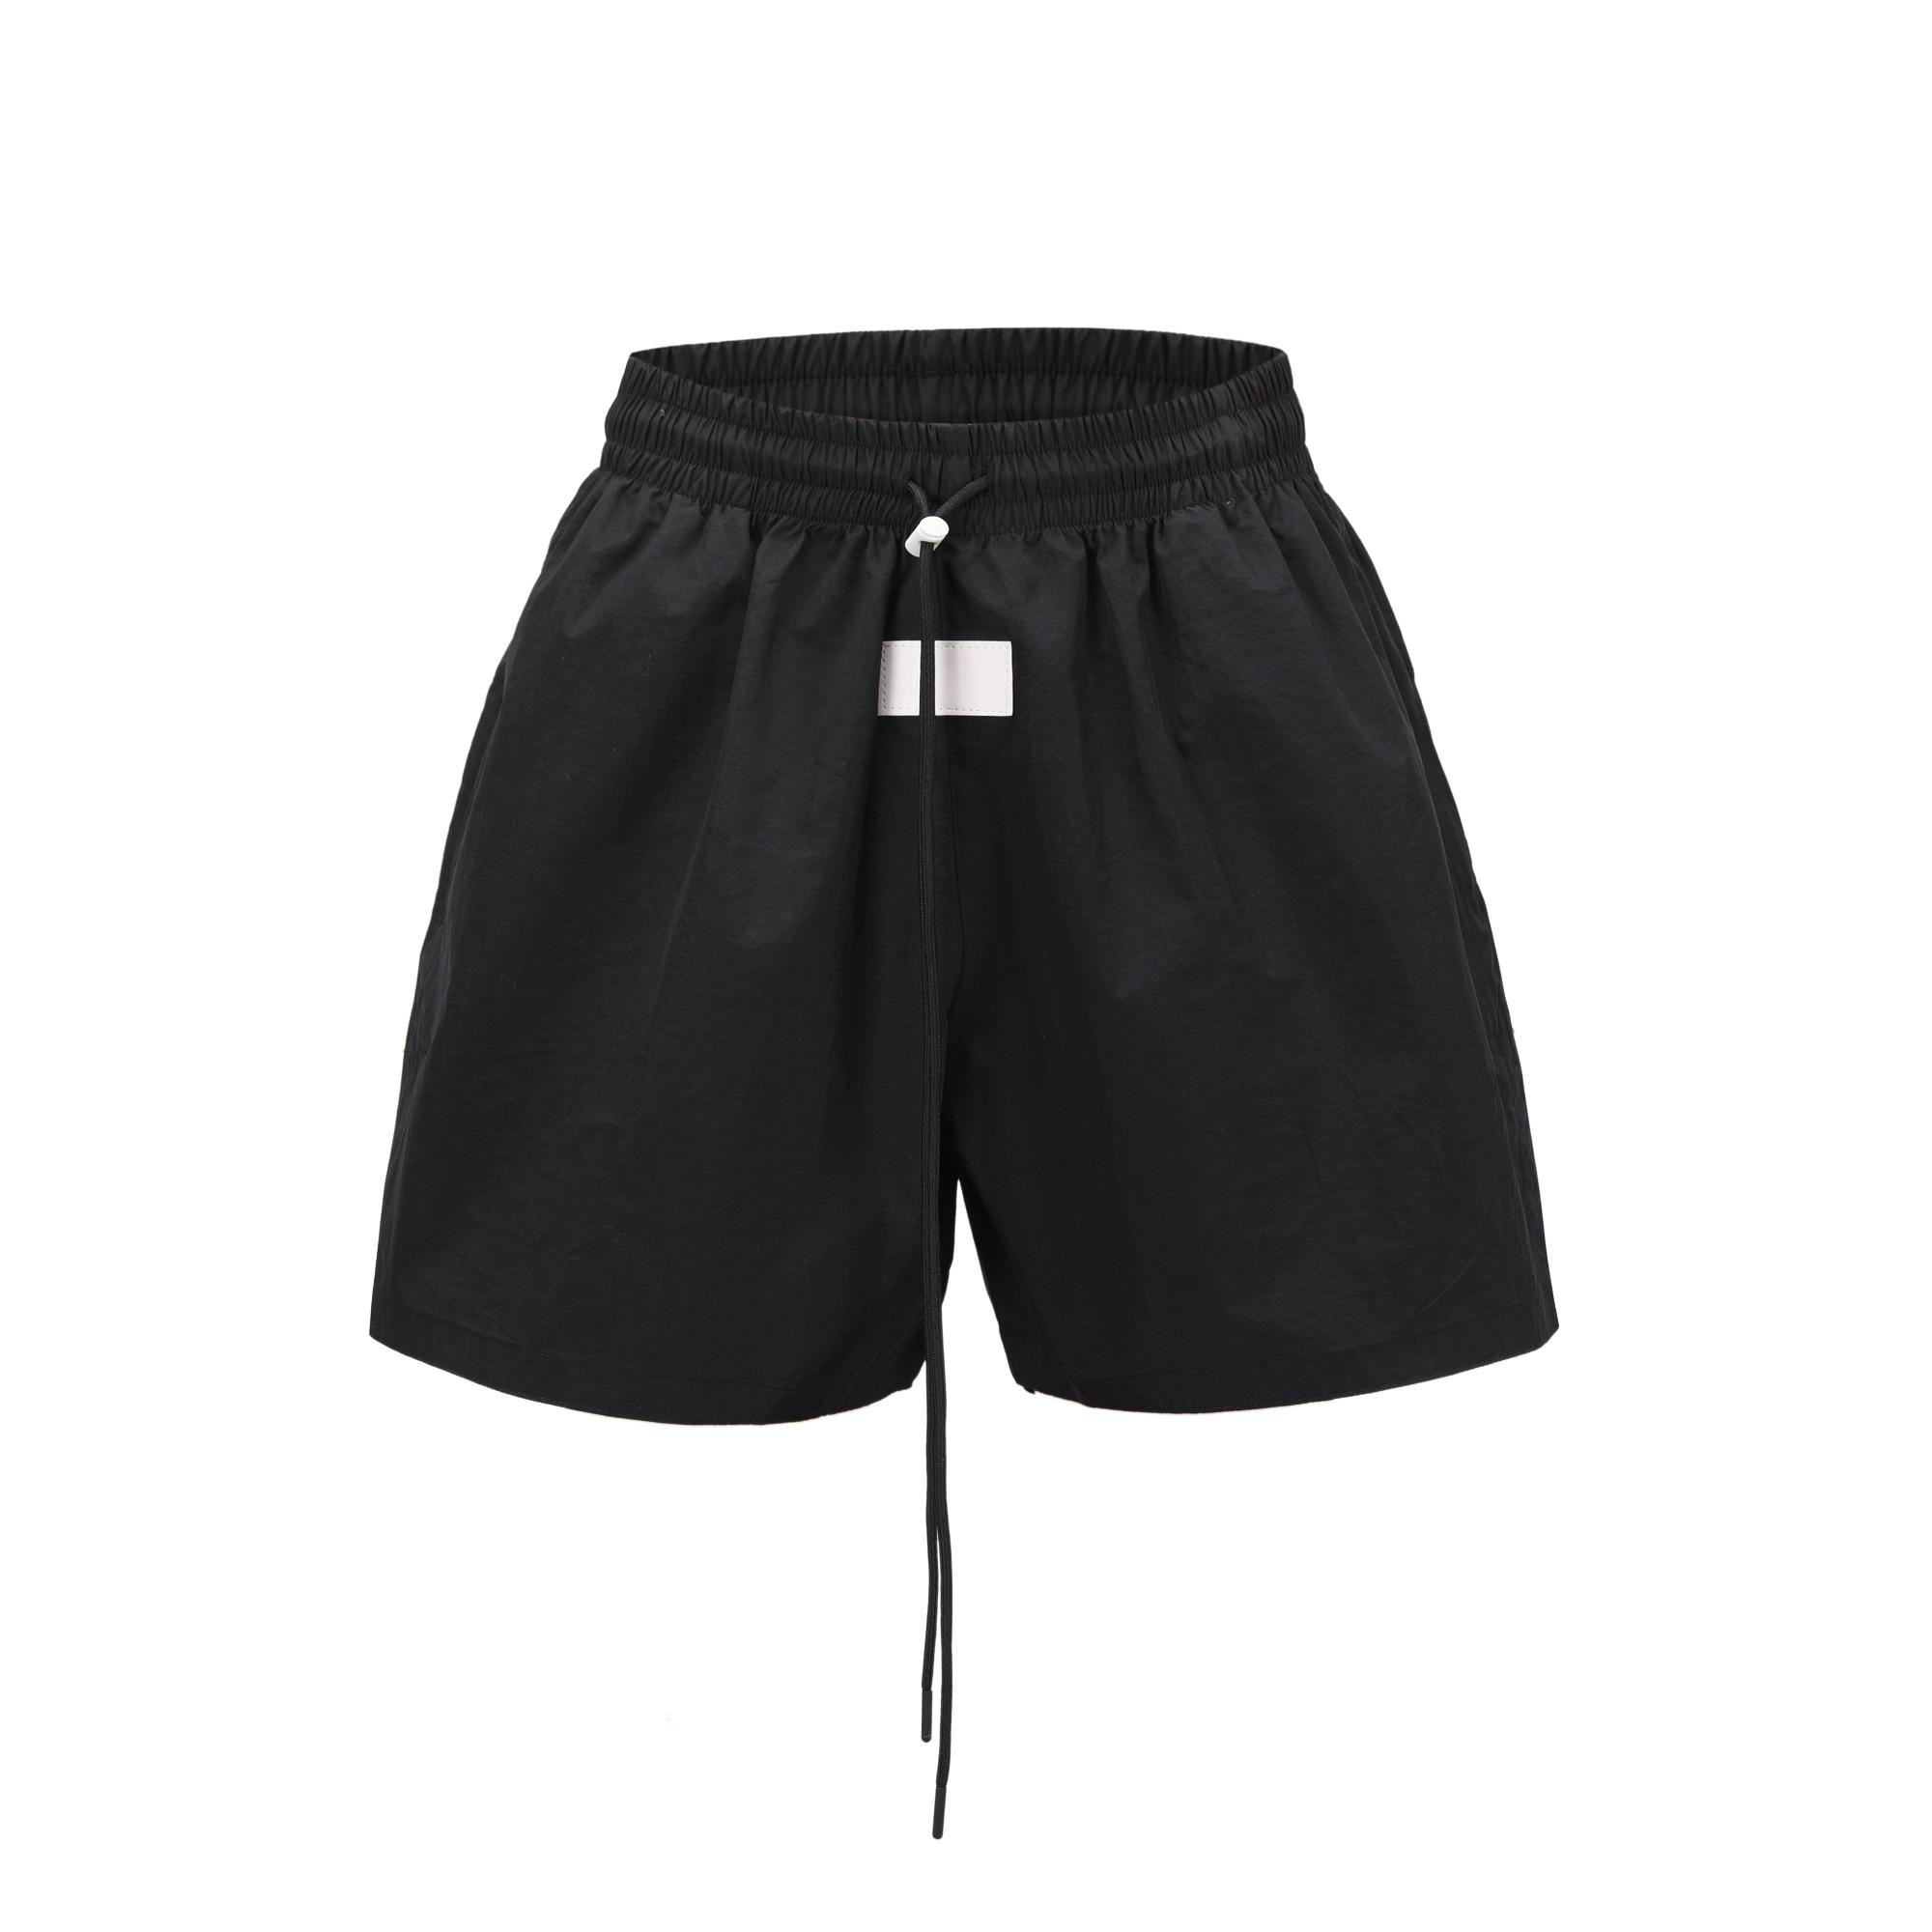 NEW GOD Shorts Sports Shorts Men And Women Drawstring Running Hot Shorts Jogging Shorts